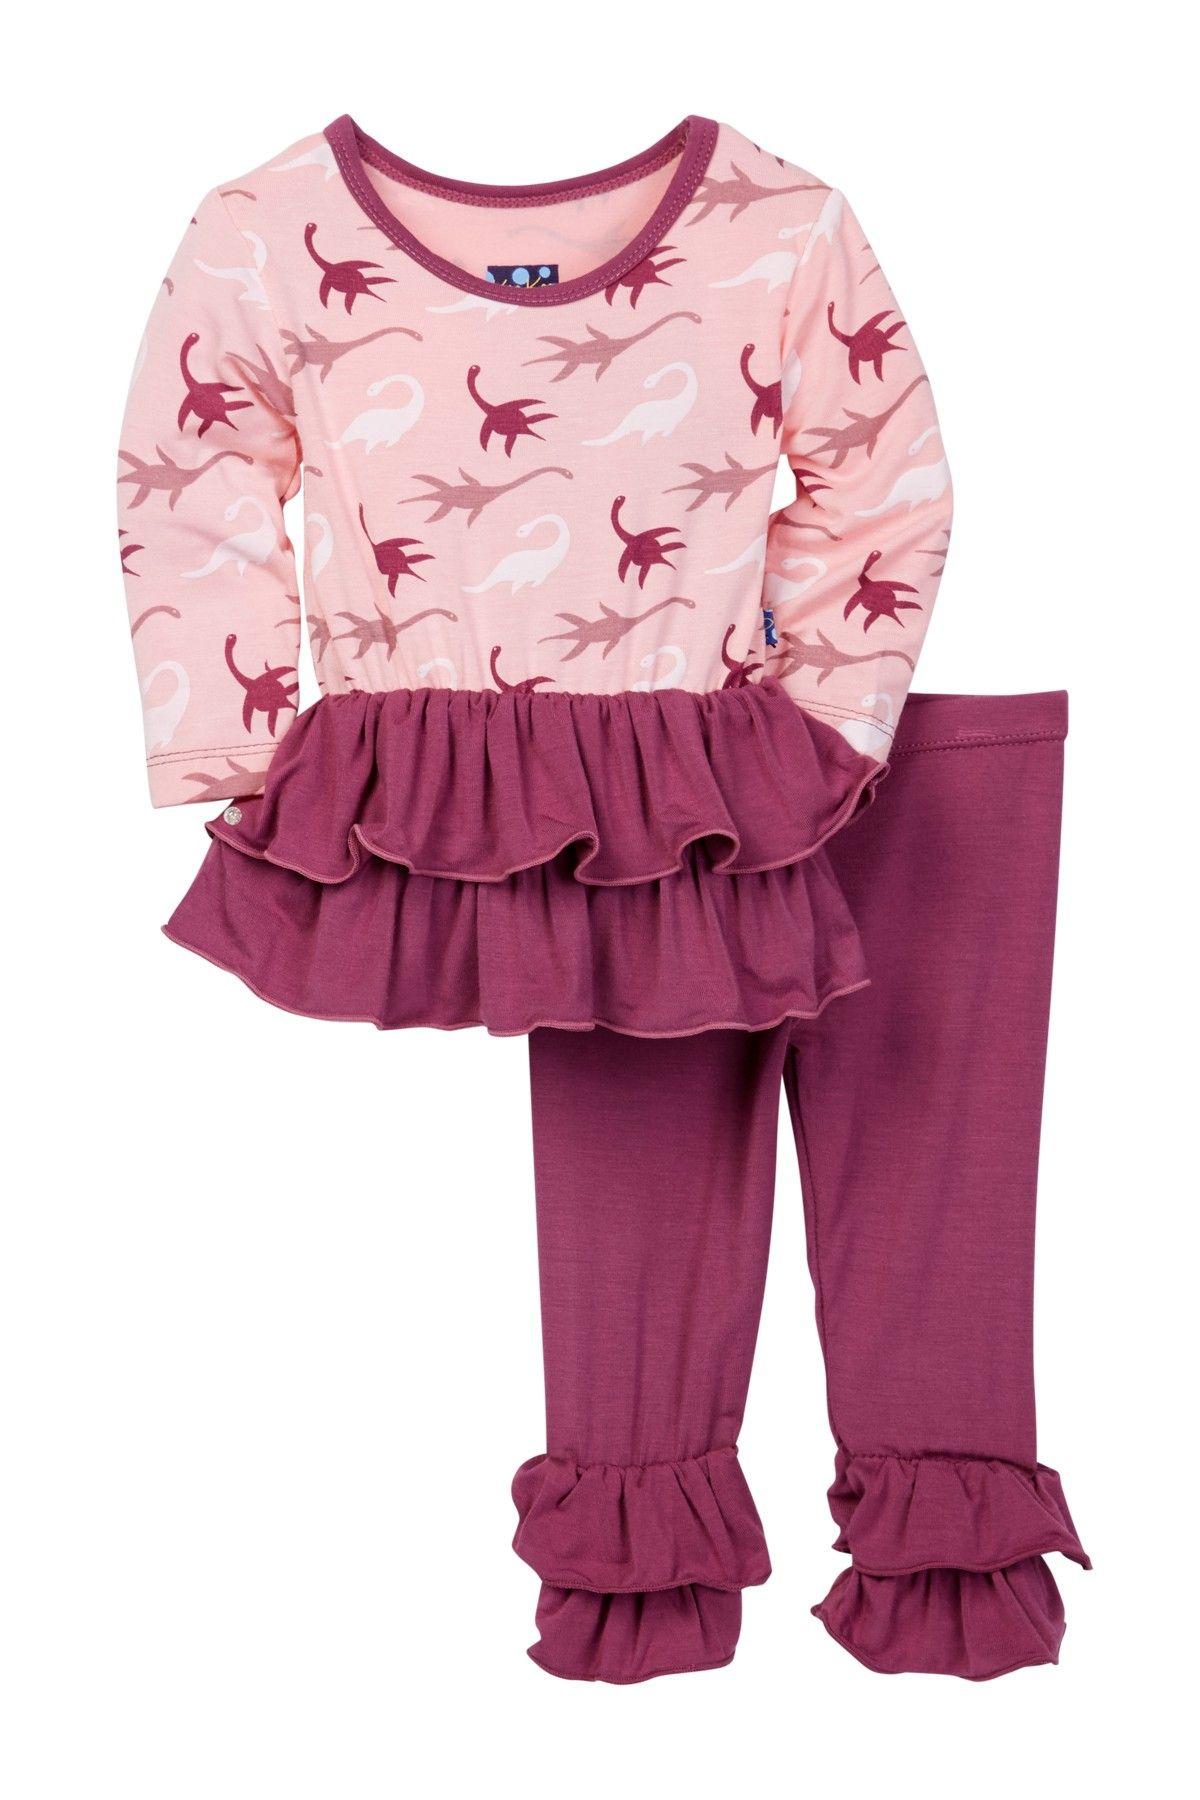 Kickee Pants Little Girls Double Ruffle Outfit Set